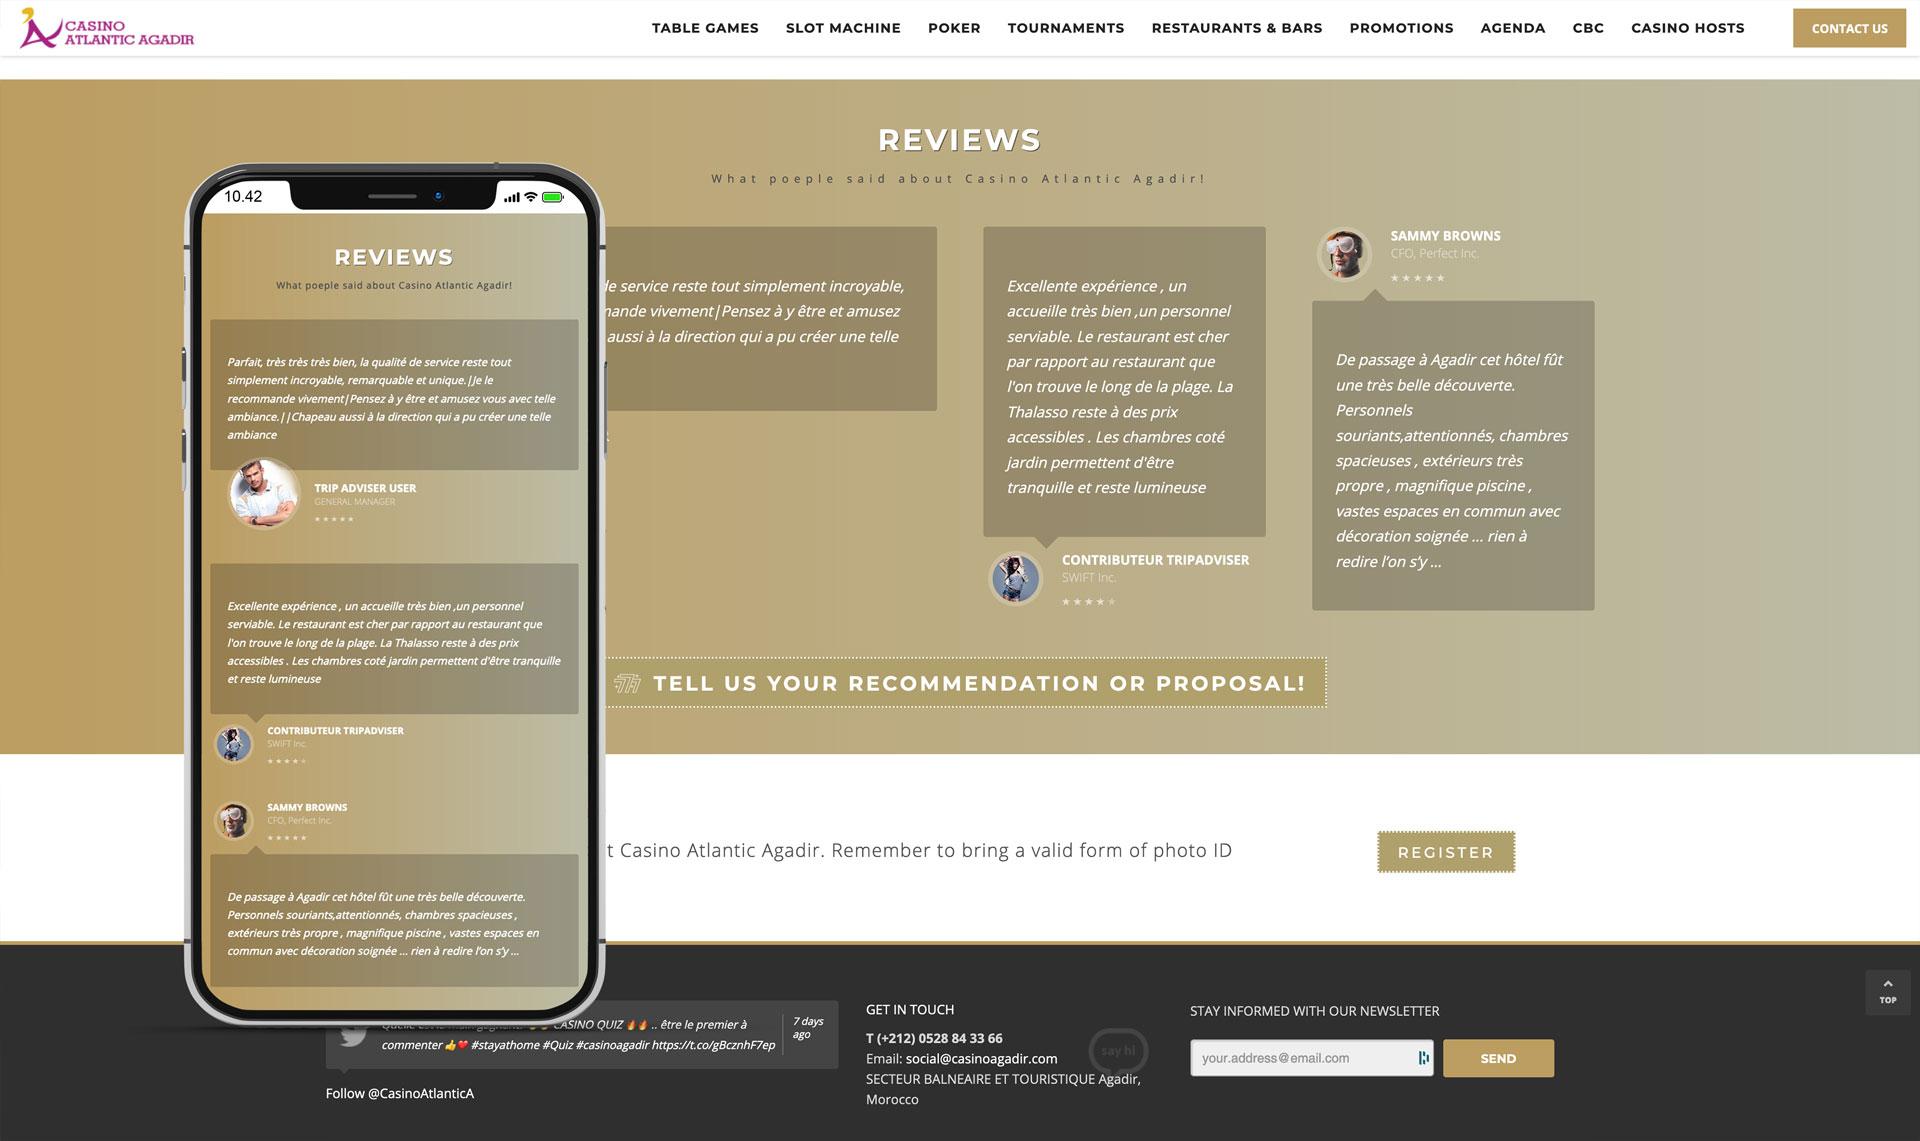 casino-atlantic-agadir-agence-communication-casablanca-maroc-2